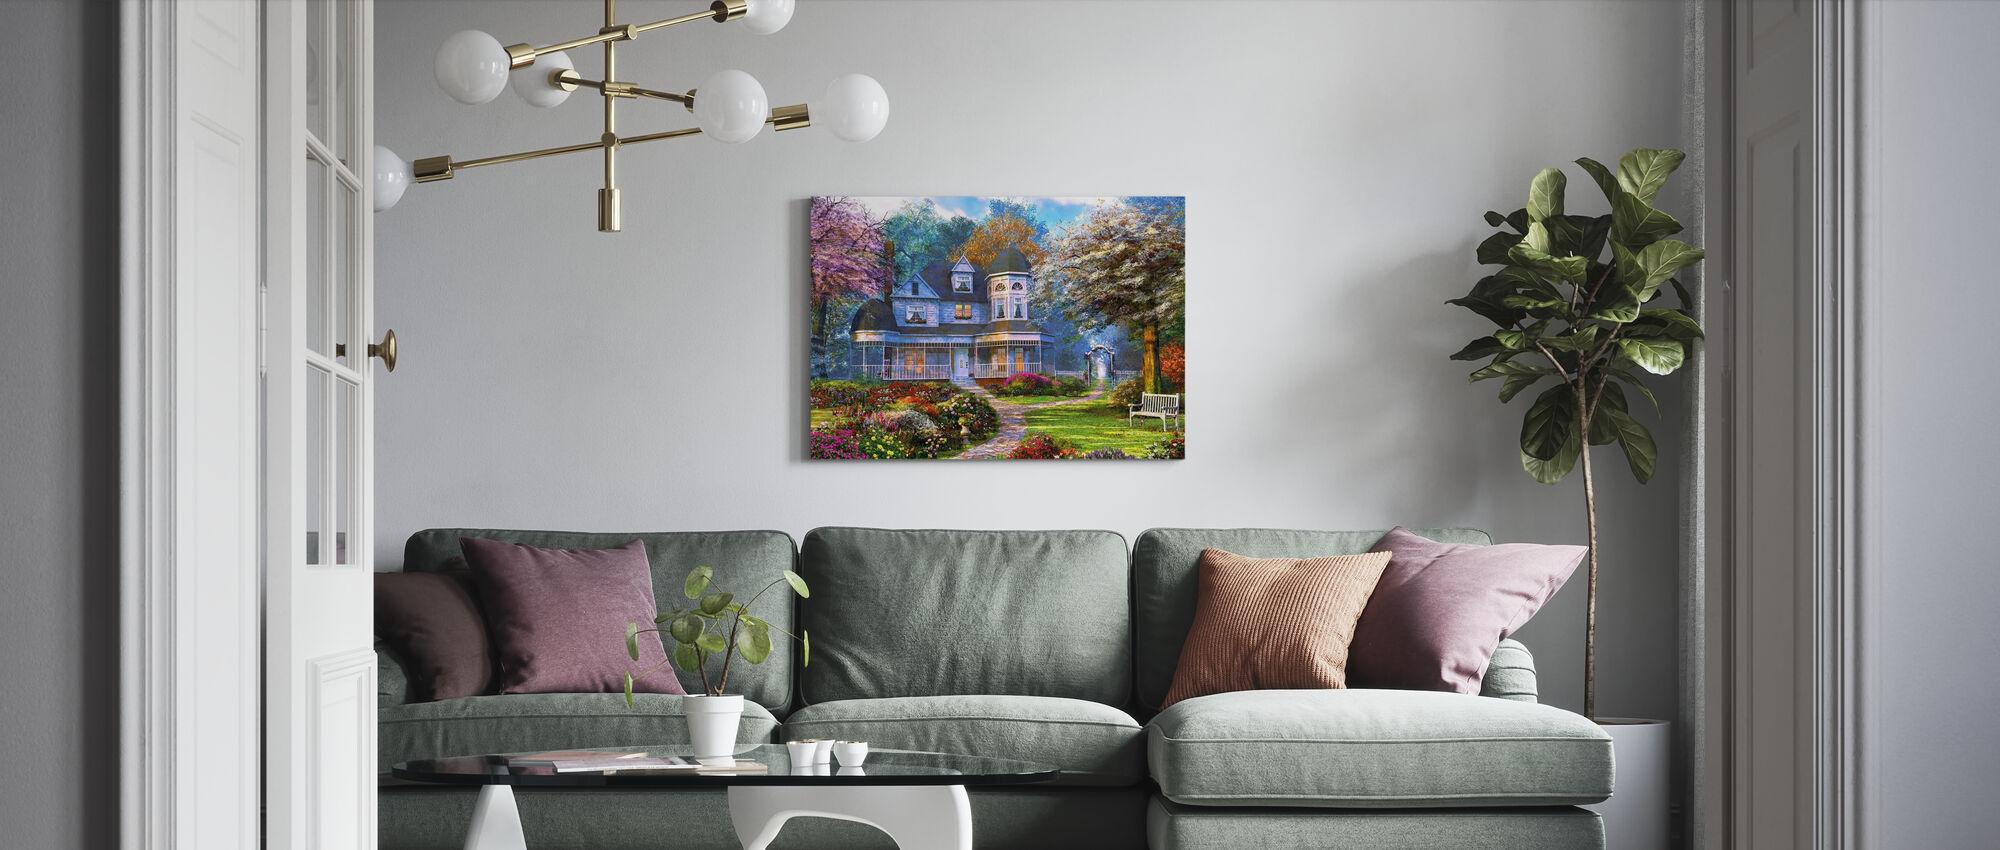 Victorian Home - Canvas print - Living Room